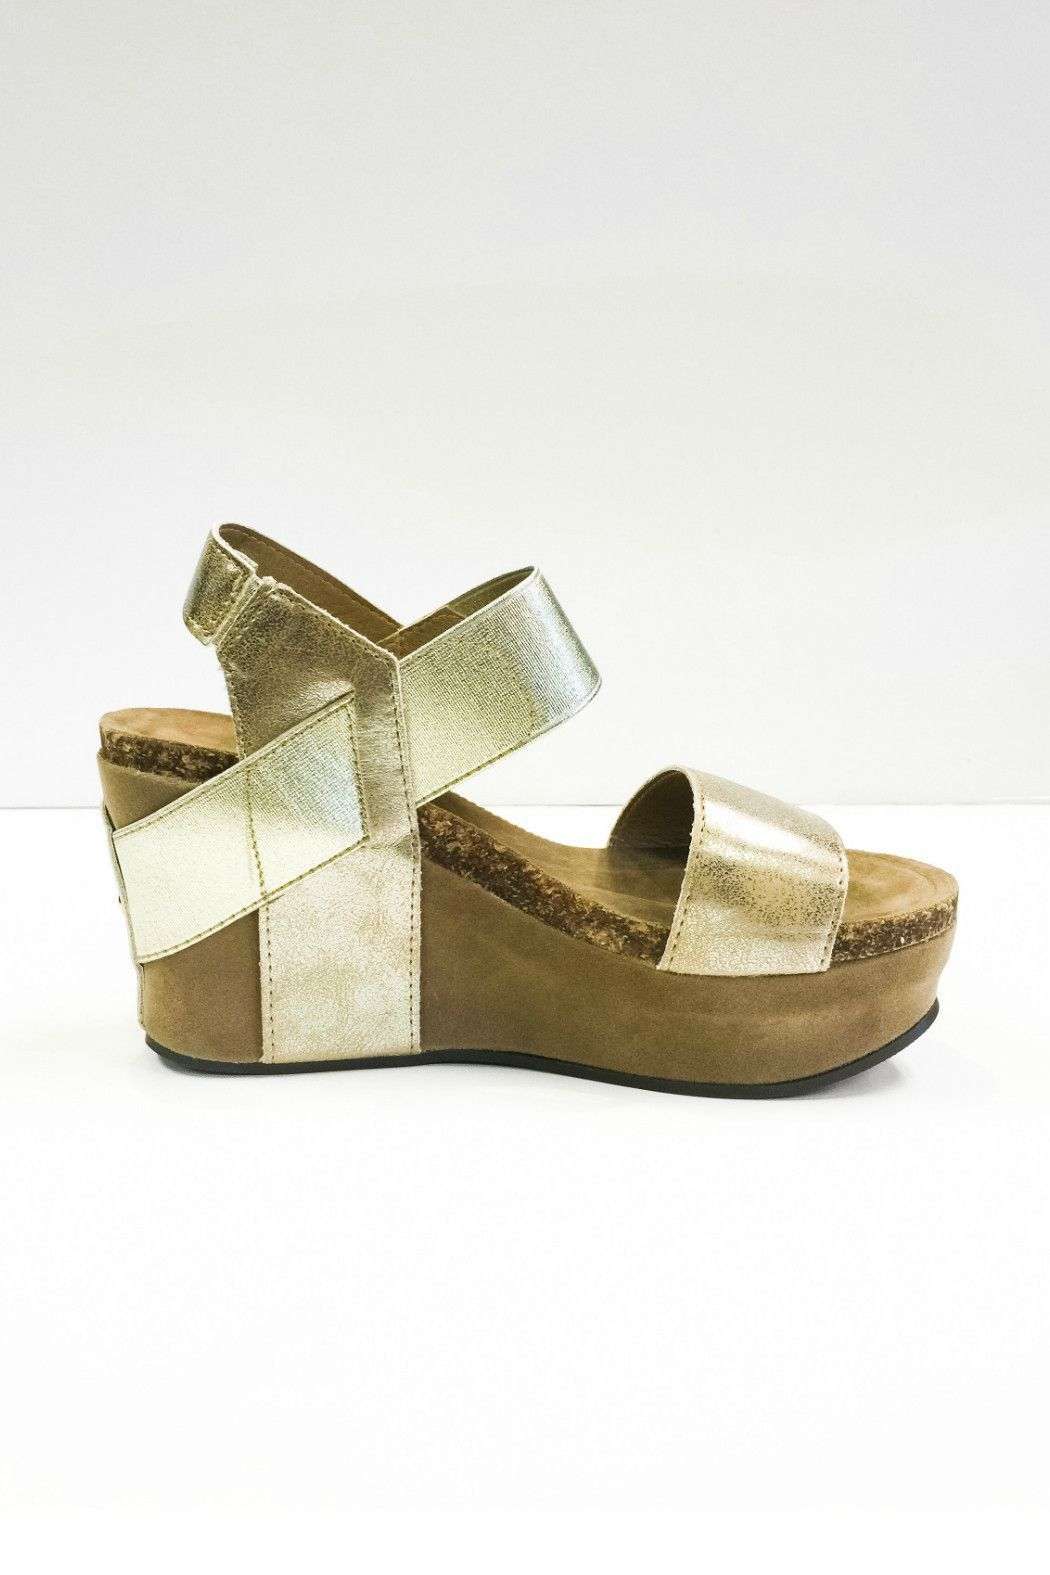 d26baa9103b64 Gold Pierre Dumas Wedge | Shoes | Pierre dumas wedges, Wedges, Wedge ...